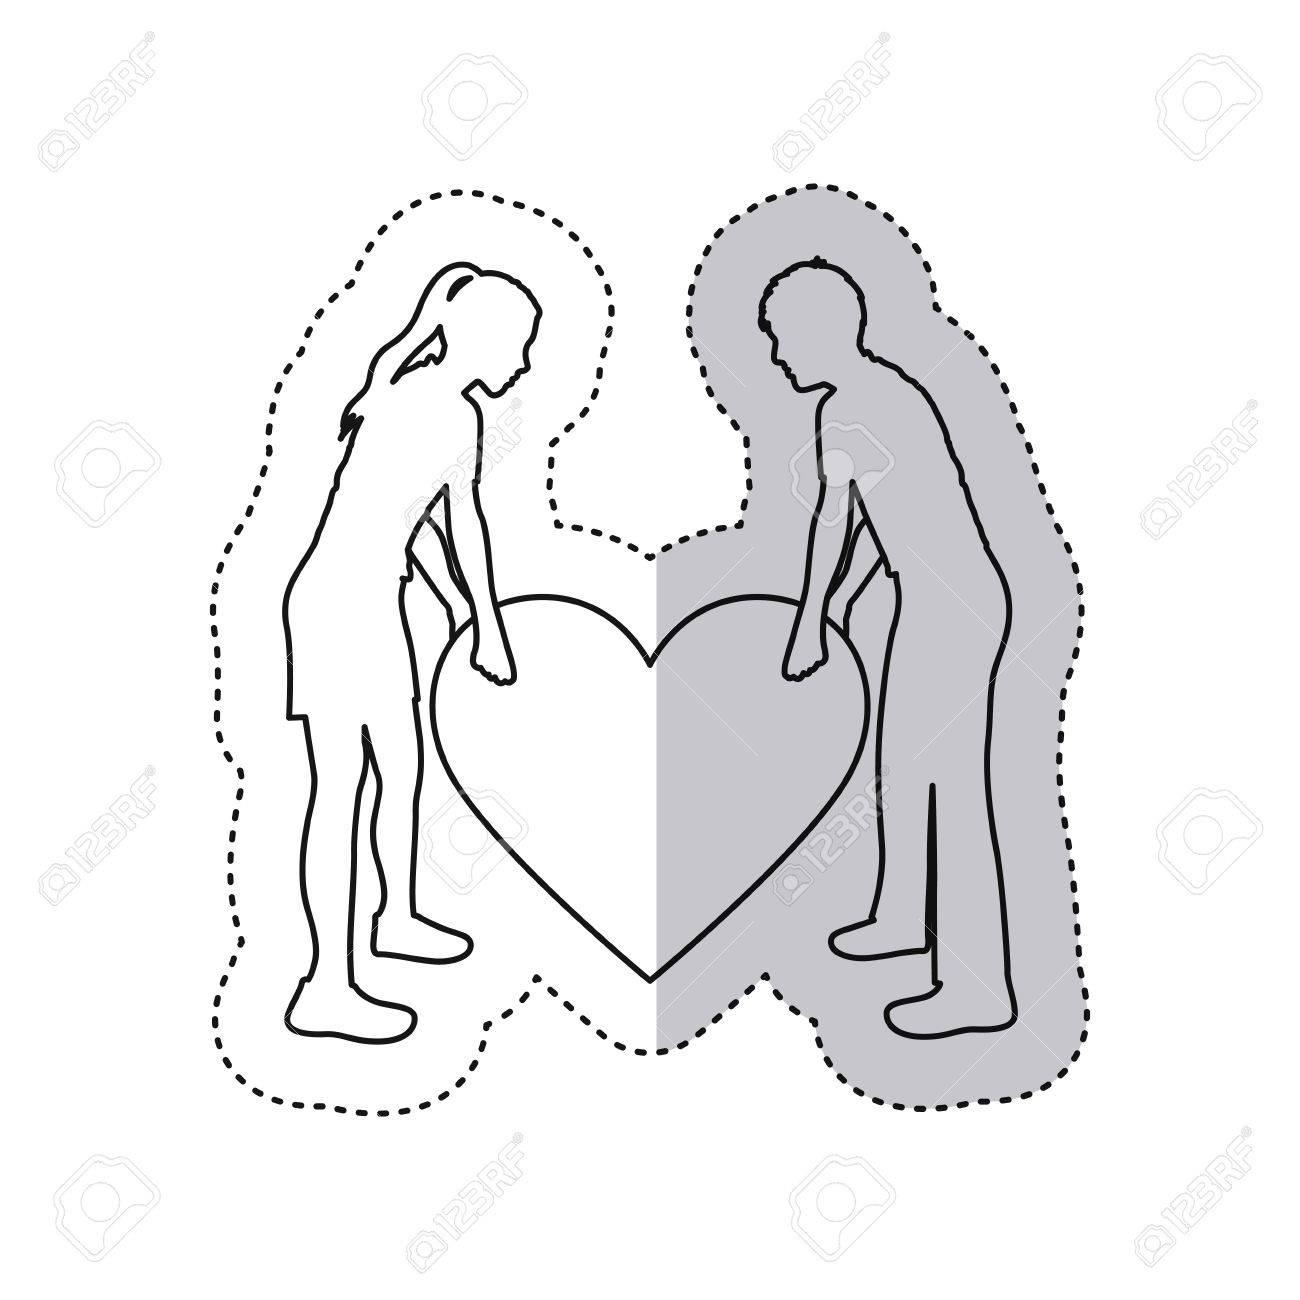 Sticker Monochrome Contour With Couple Holding A Big Heart Vector ... for Couple Sticker Line  67qdu